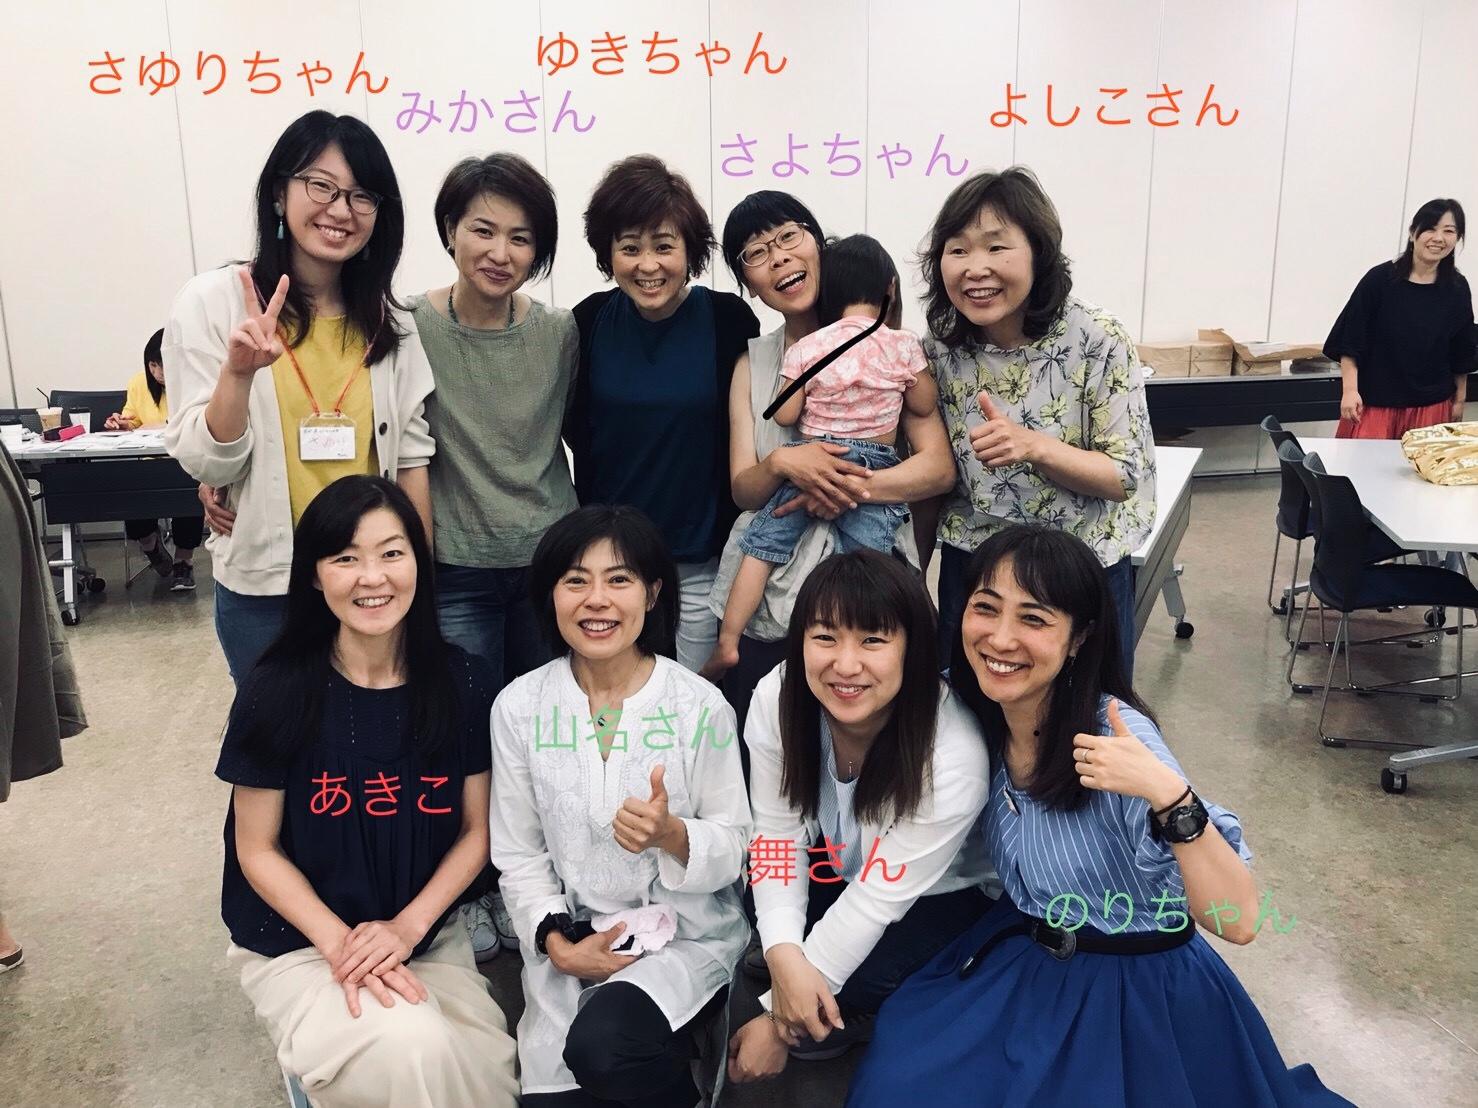 2019/6/25 1010HAPPY 藤沢クラスAグループ